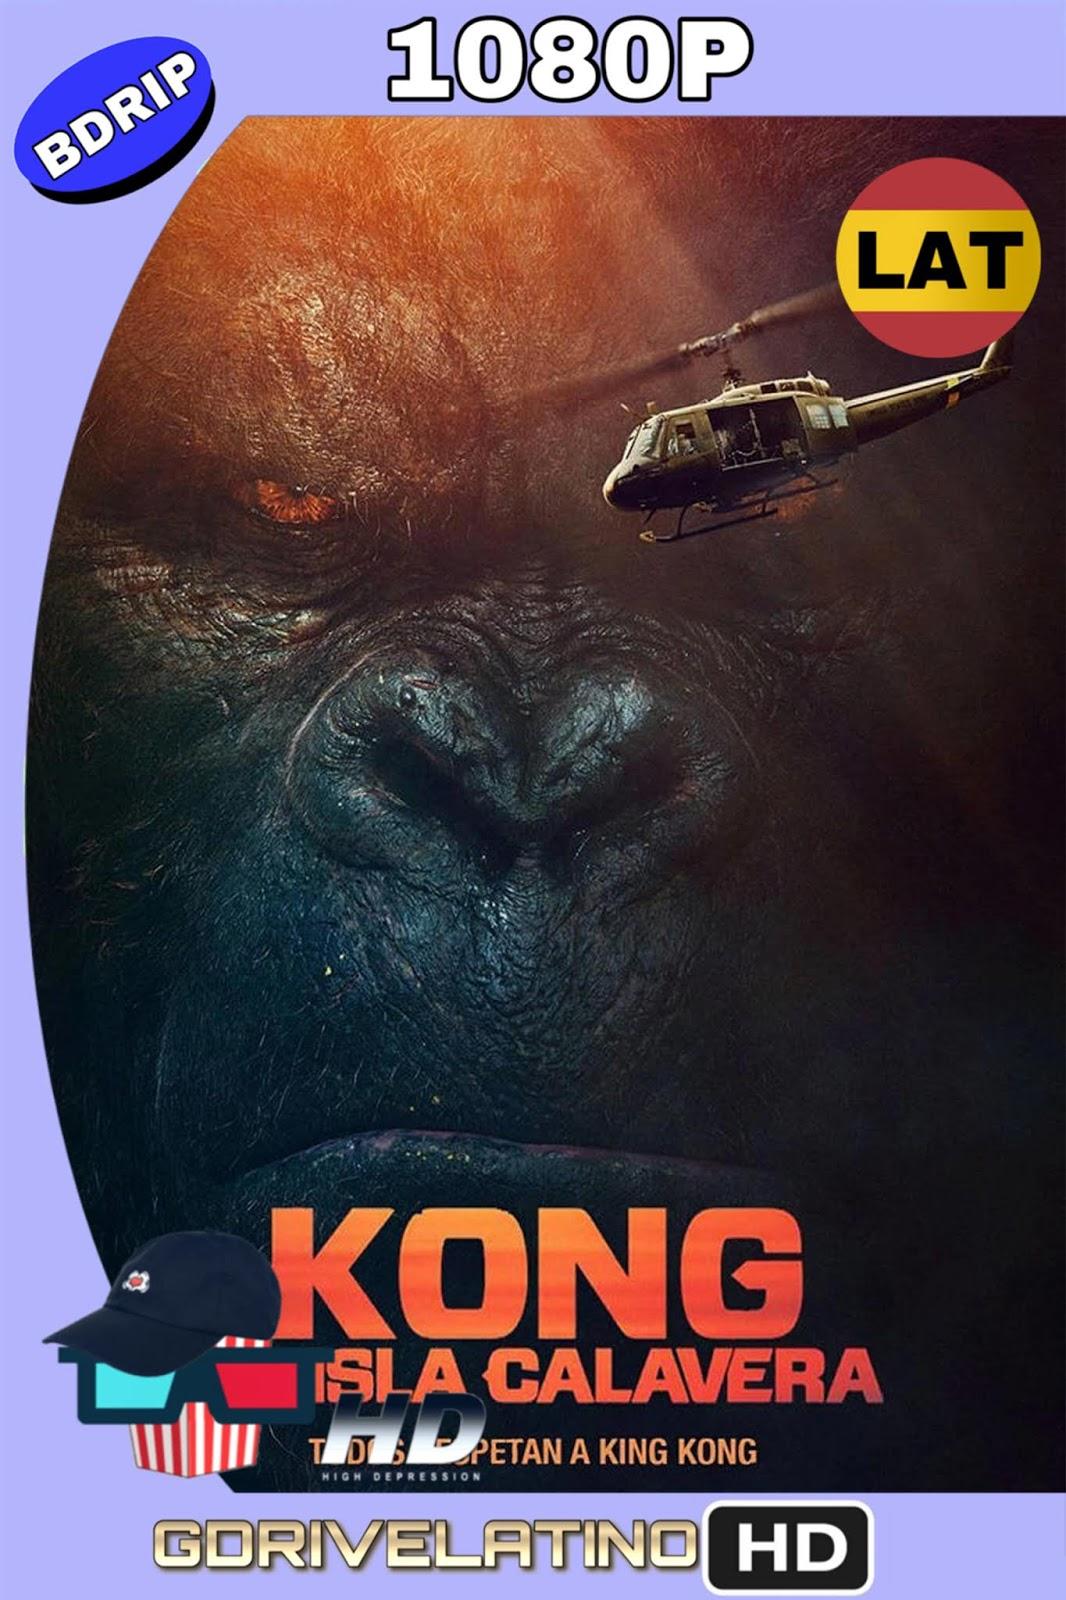 Kong: La isla Calavera (2017) BDrip 1080p (Latino-Inglés) MKV